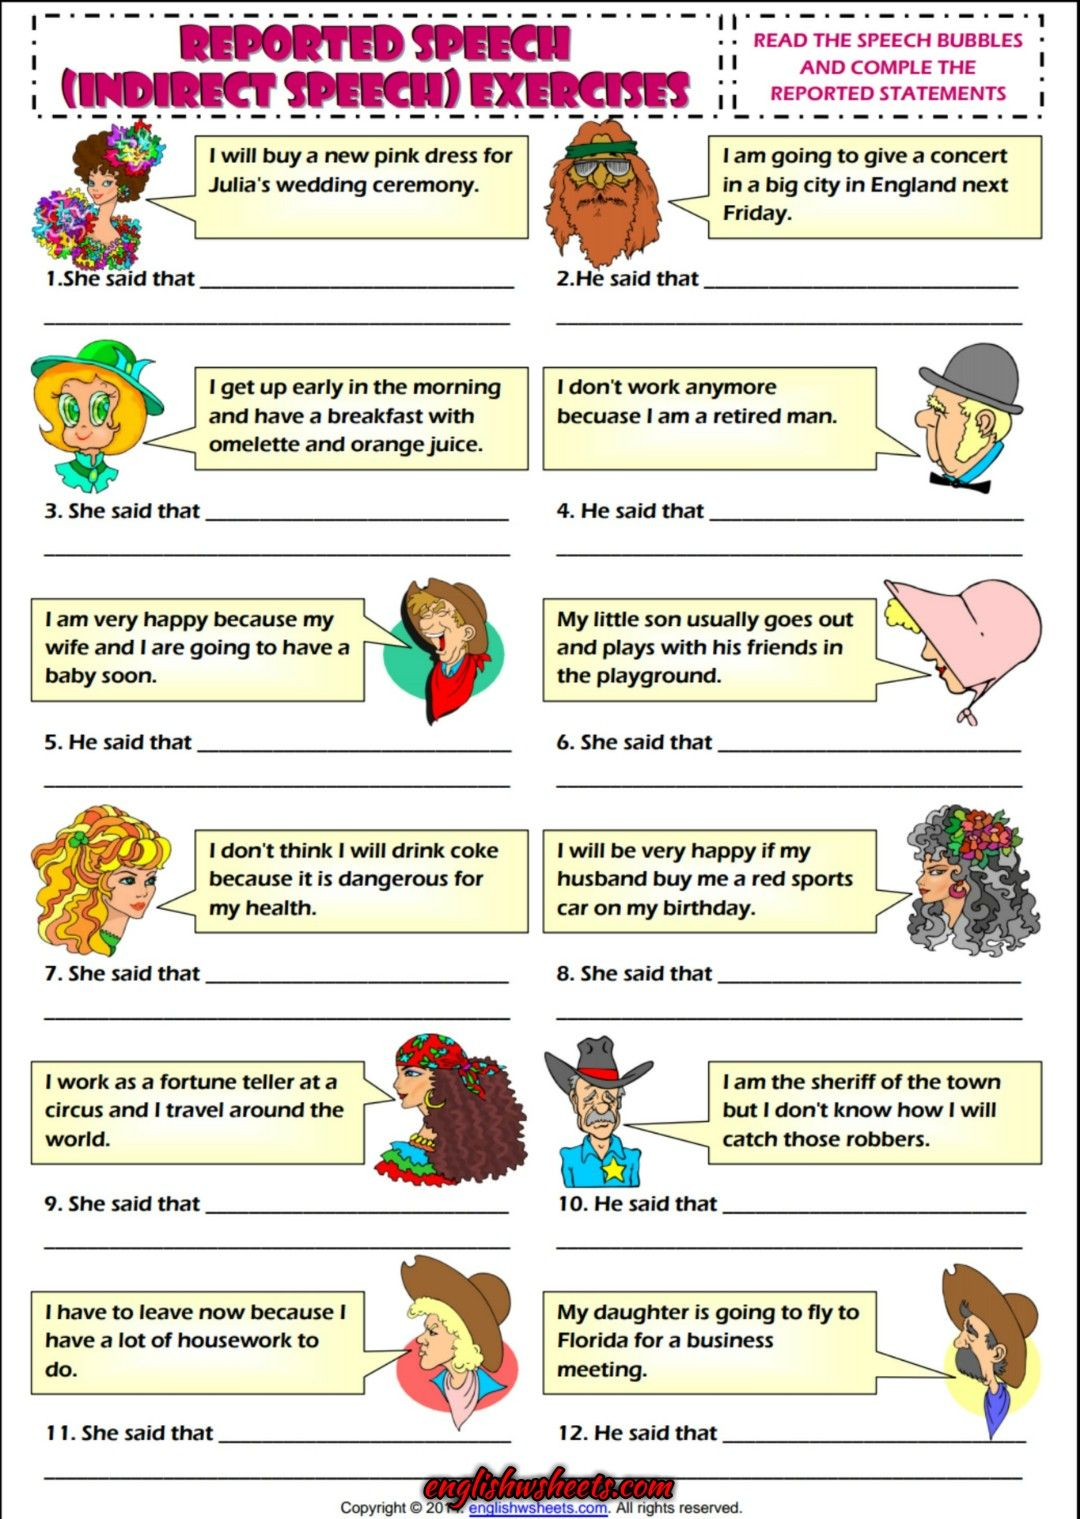 Indirect Speech ESL Grammar Exercise Worksheet   Indirect speech [ 1519 x 1080 Pixel ]